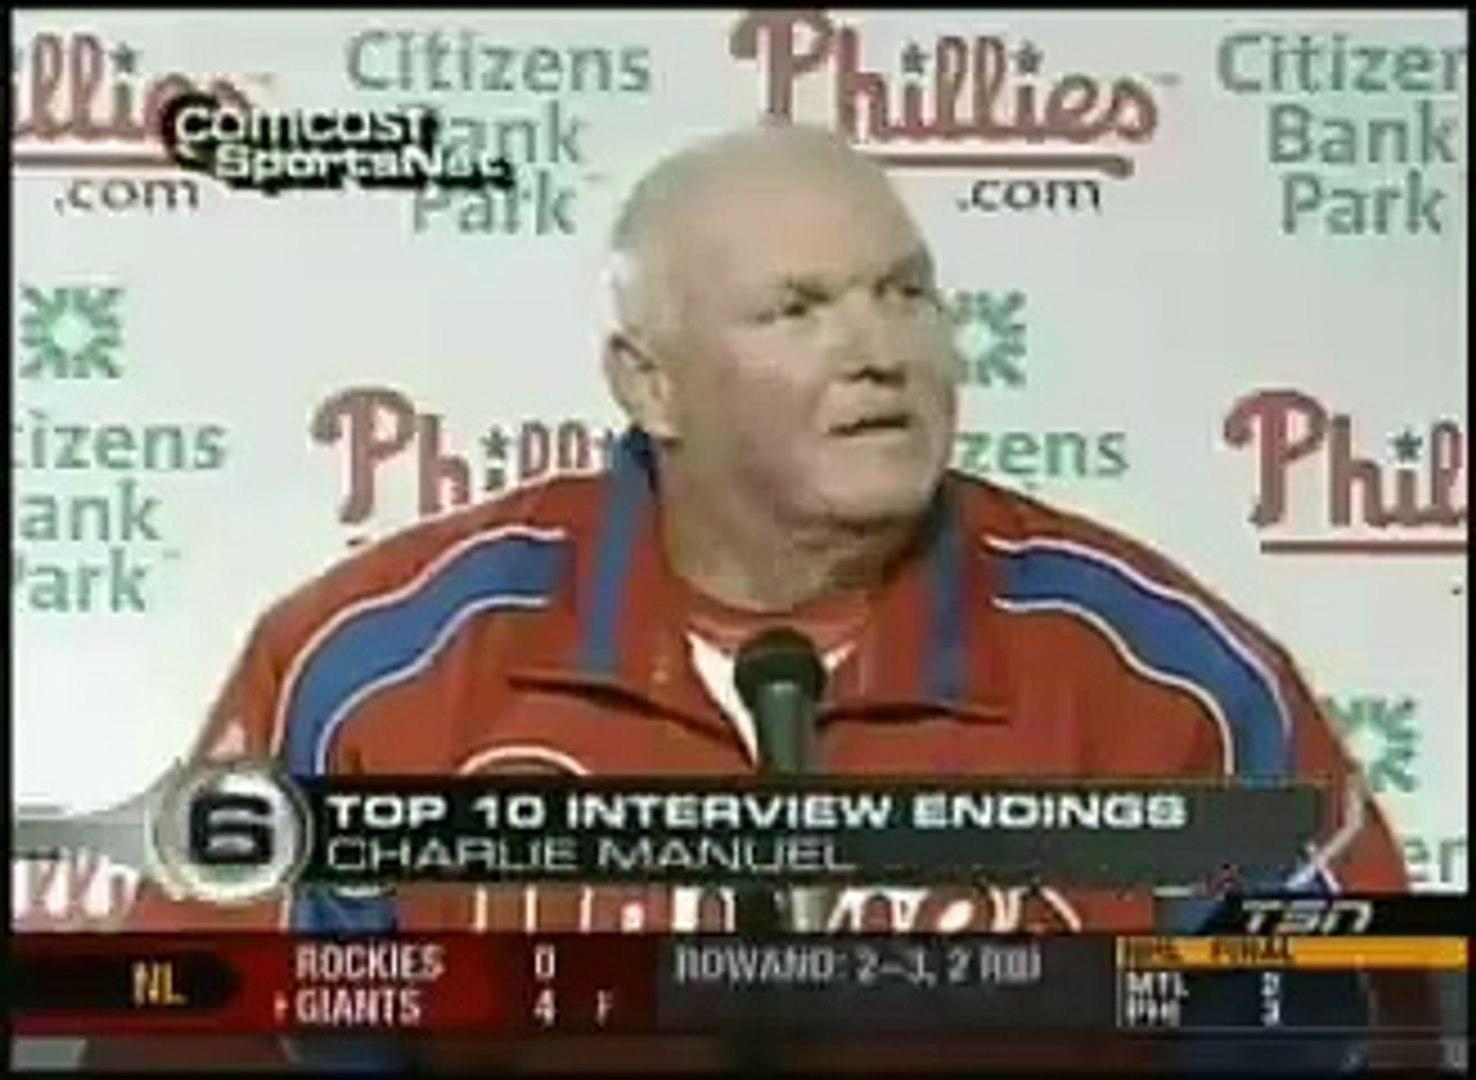 Top 10 Best sports interview endings